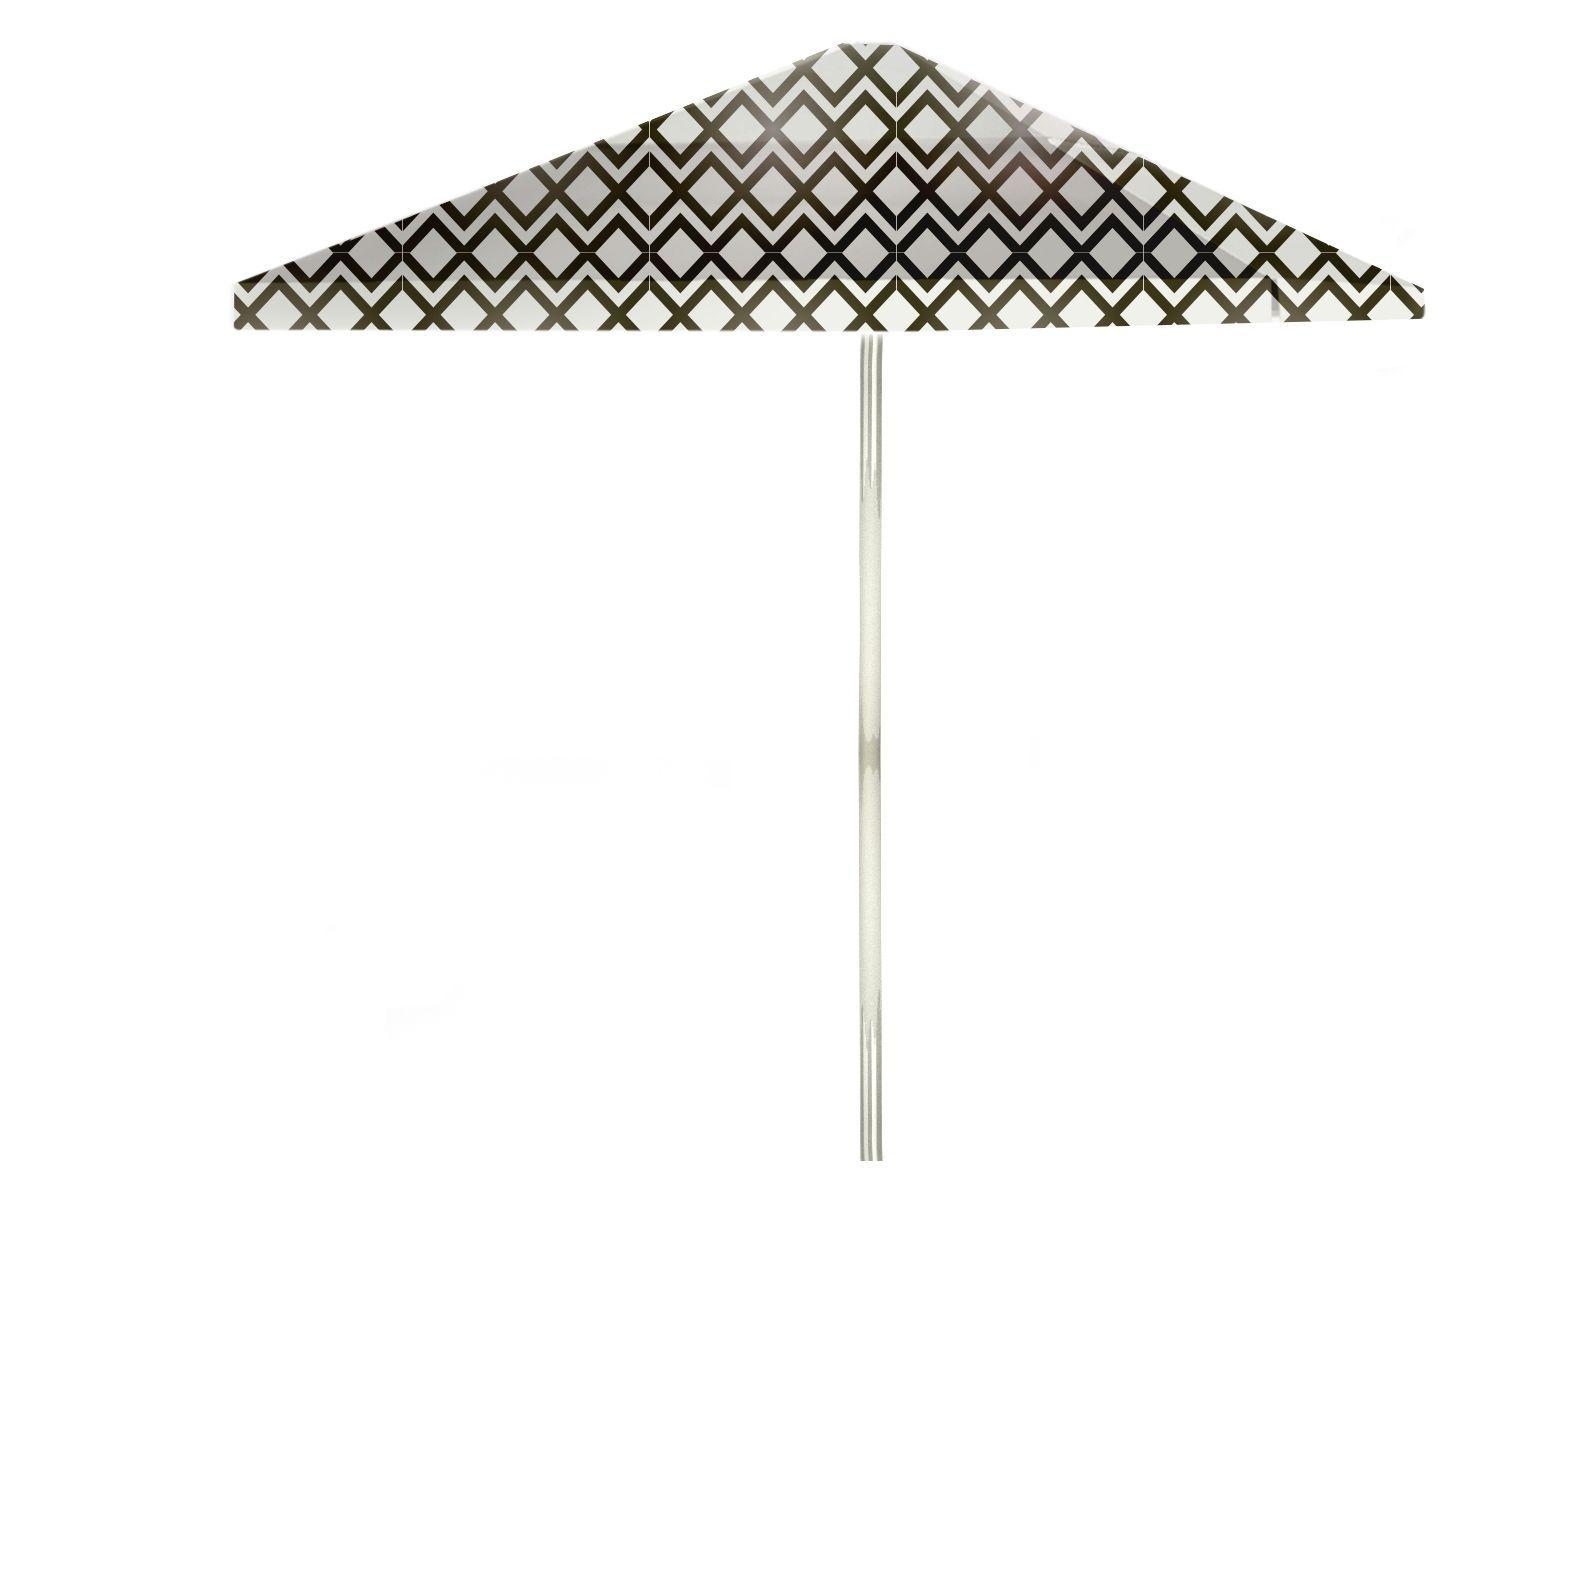 Best of Times Chevron 8 foot Patio Umbrella Chevron Gold